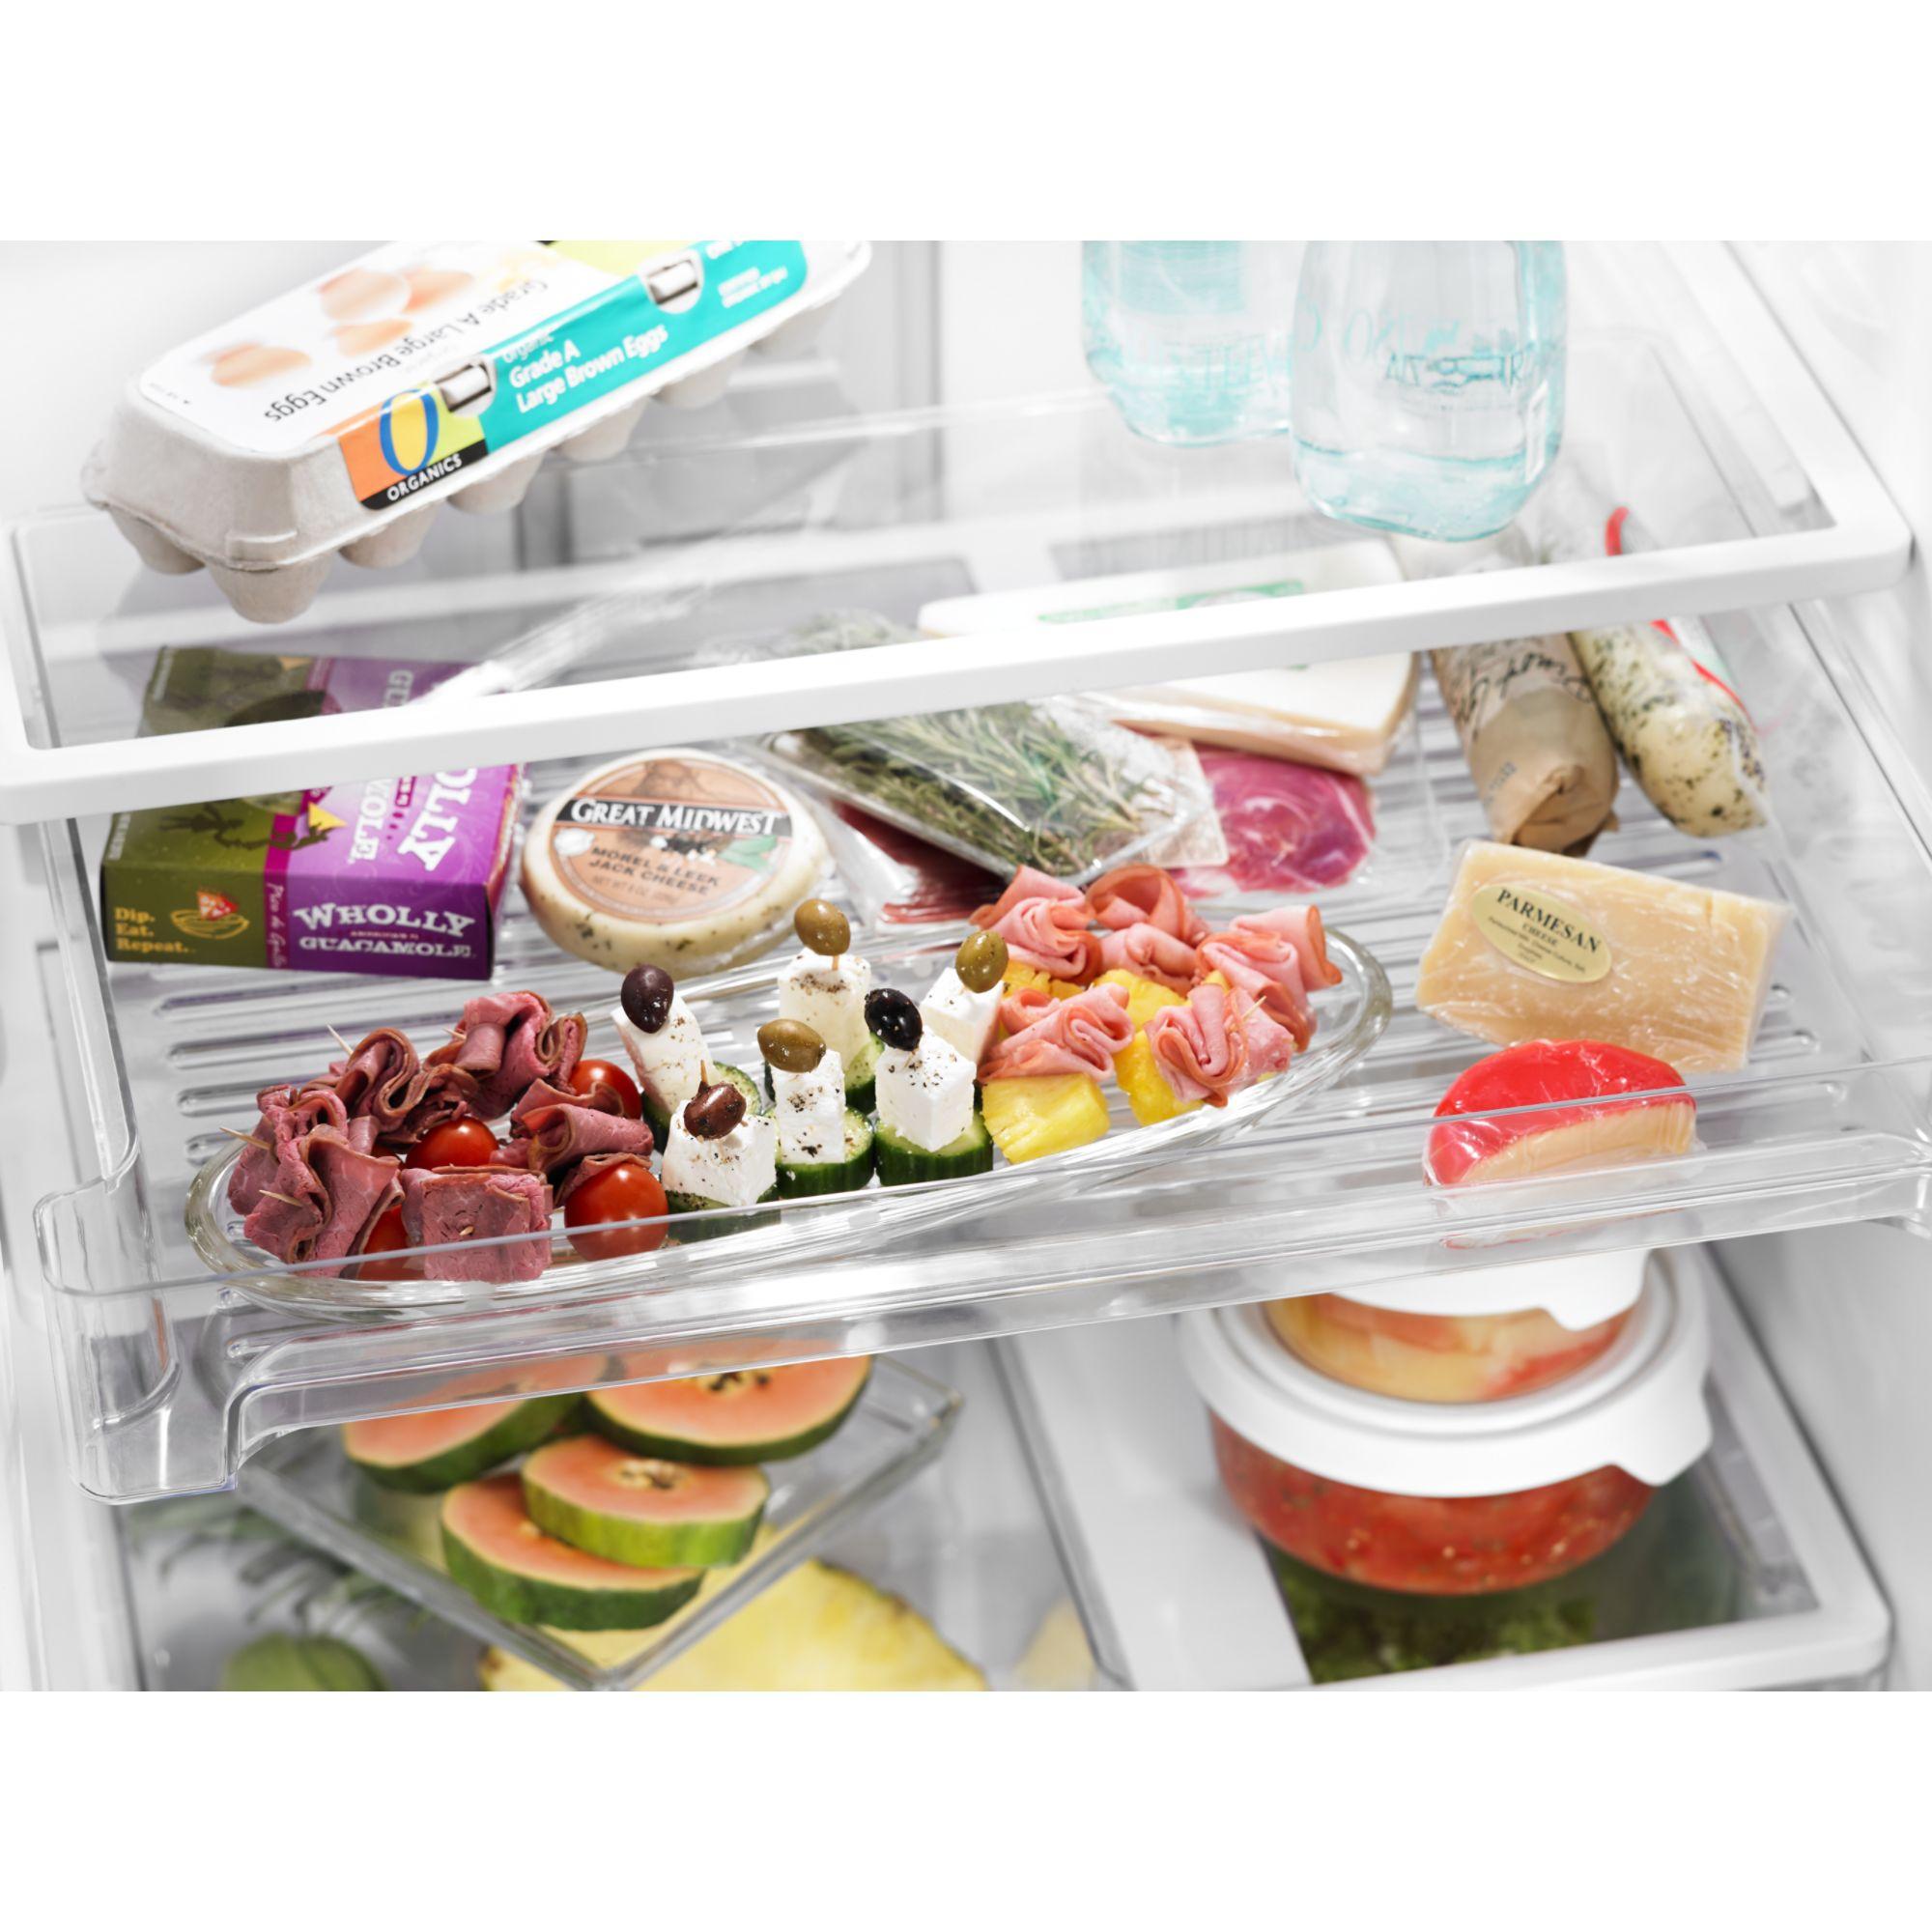 Whirlpool 21.1 cu. ft. Top-freezer Refrigerator w/ CEE Tier 3 Rating - Black